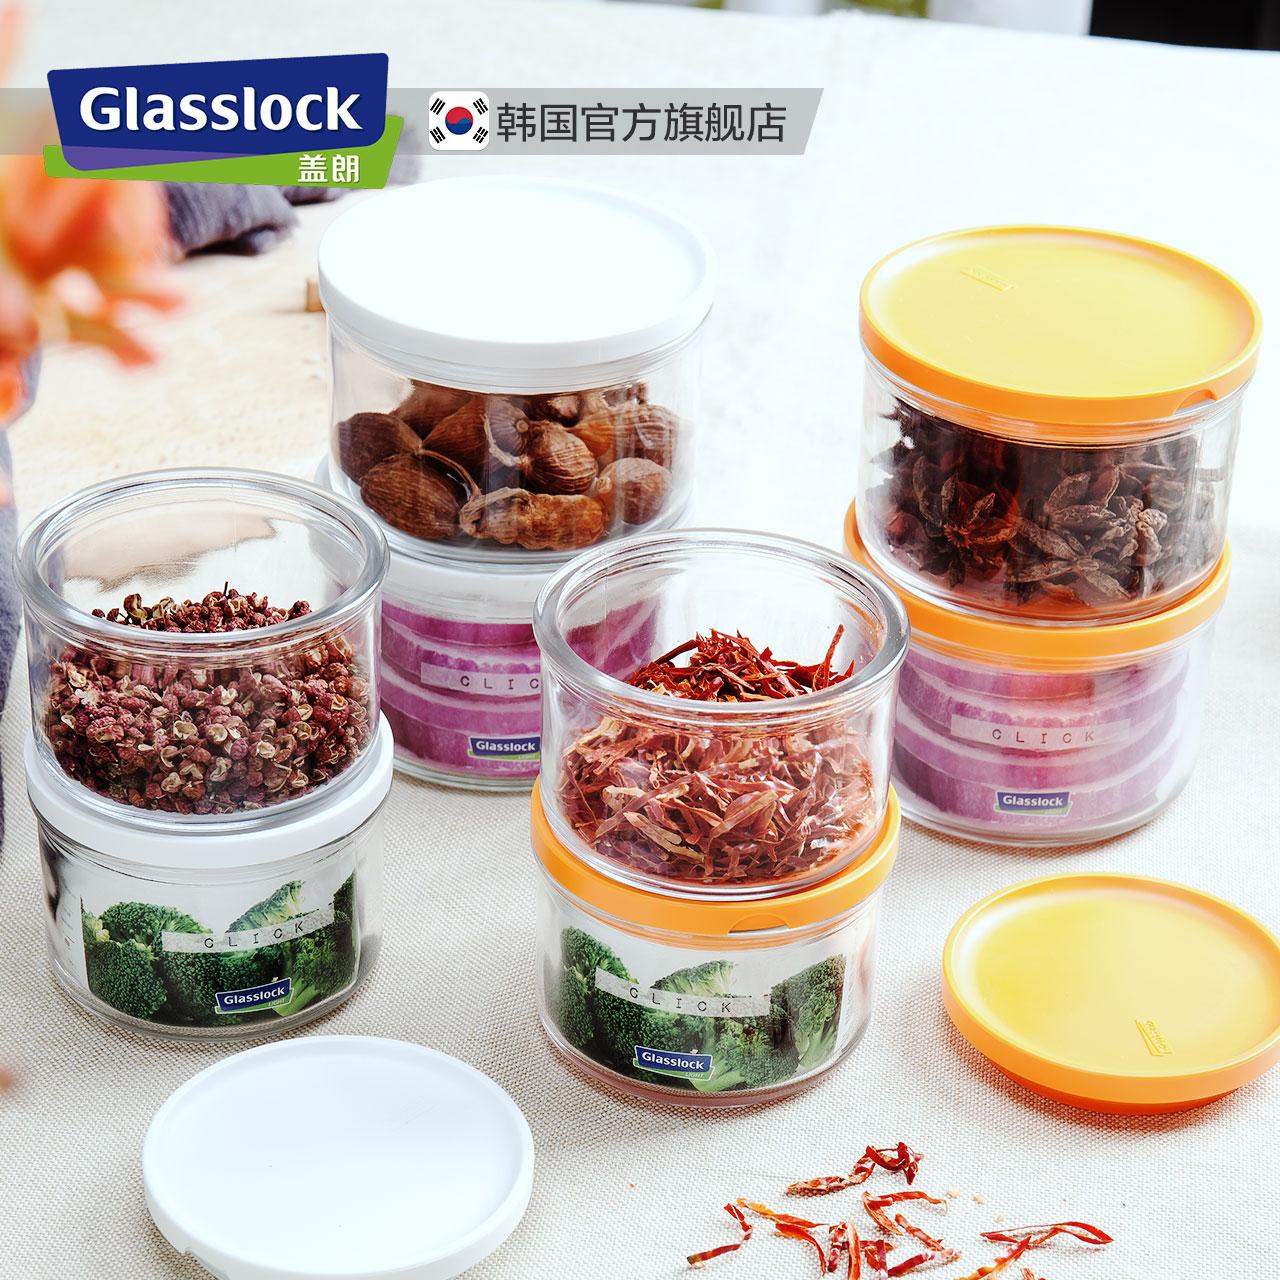 Glasslock玻璃密封罐透明瓶子食品酵素蜂蜜檸檬百香果帶蓋儲物罐